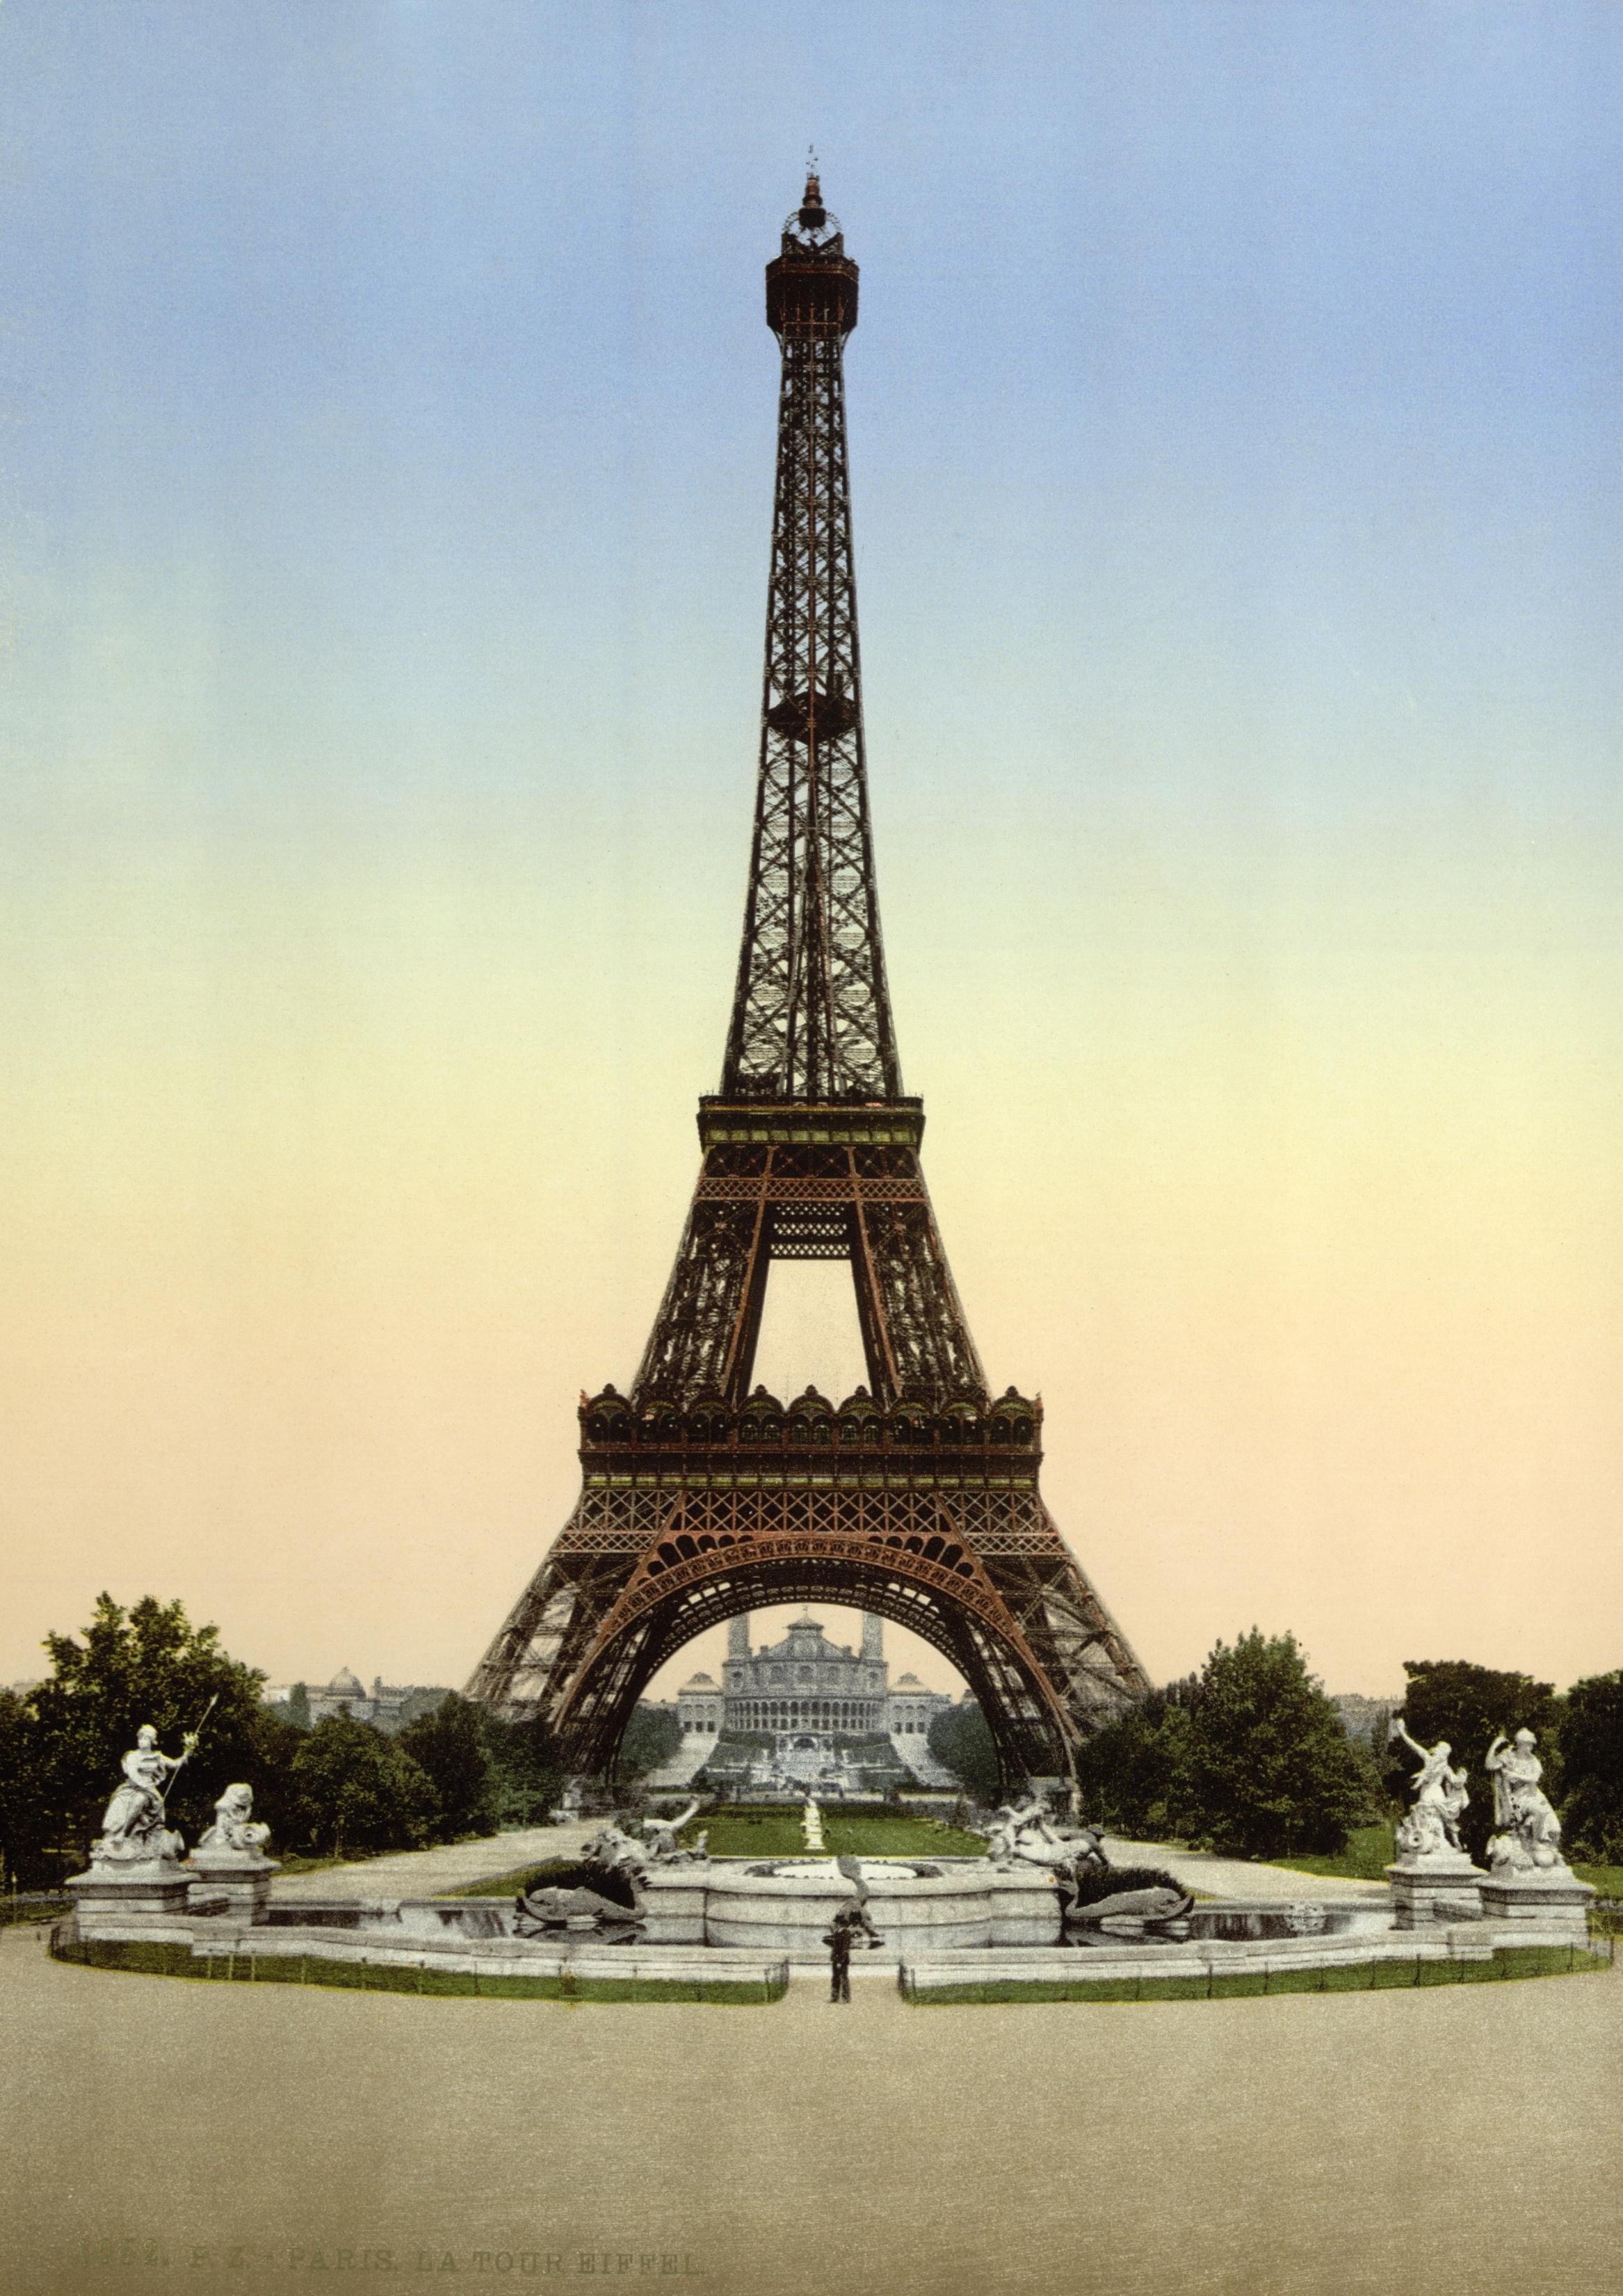 Toward the trocadero exposition universal 1900 paris france